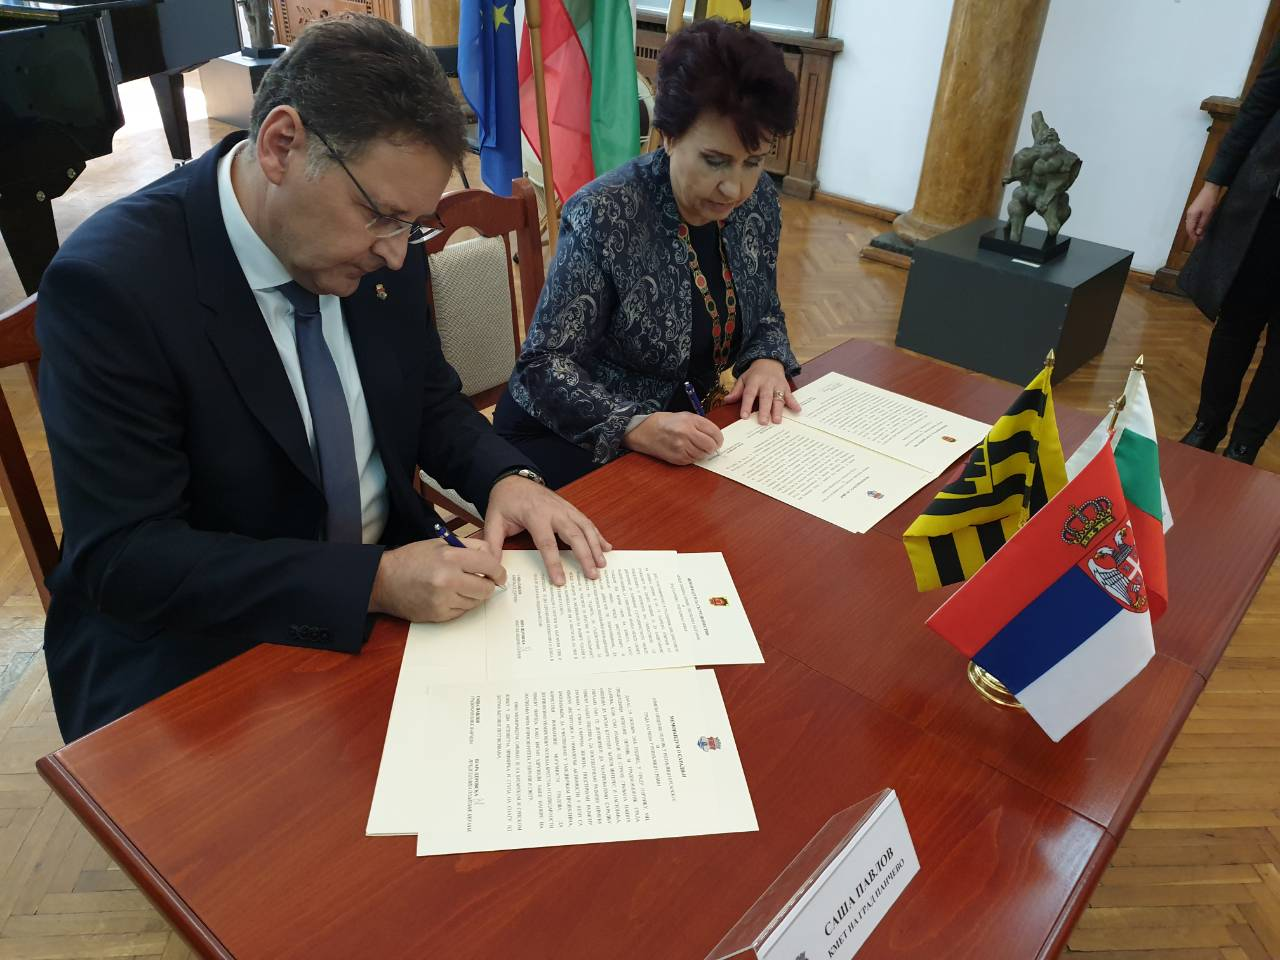 http://www.pancevo.rs/sadrzaj/uploads/2018/10/pancevo-i-pernik.jpg